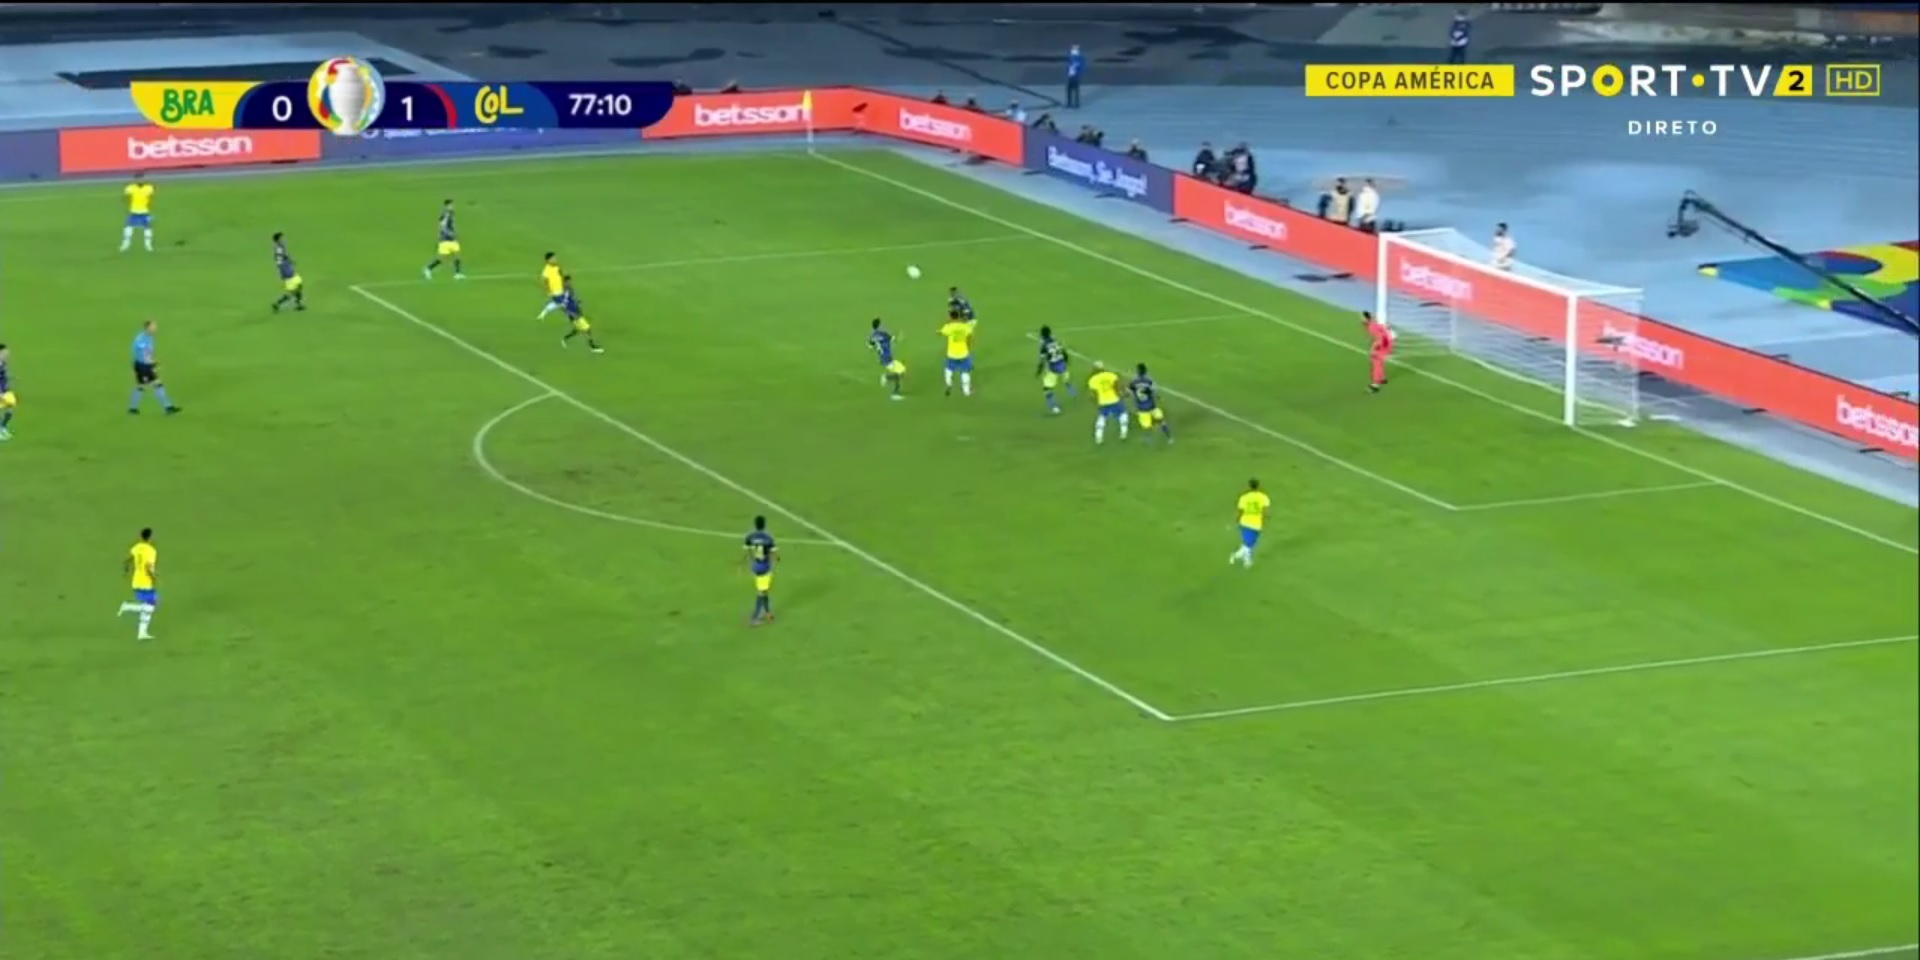 (Video) Bobby Firmino bags crucial goal for Brazil in Copa America clash